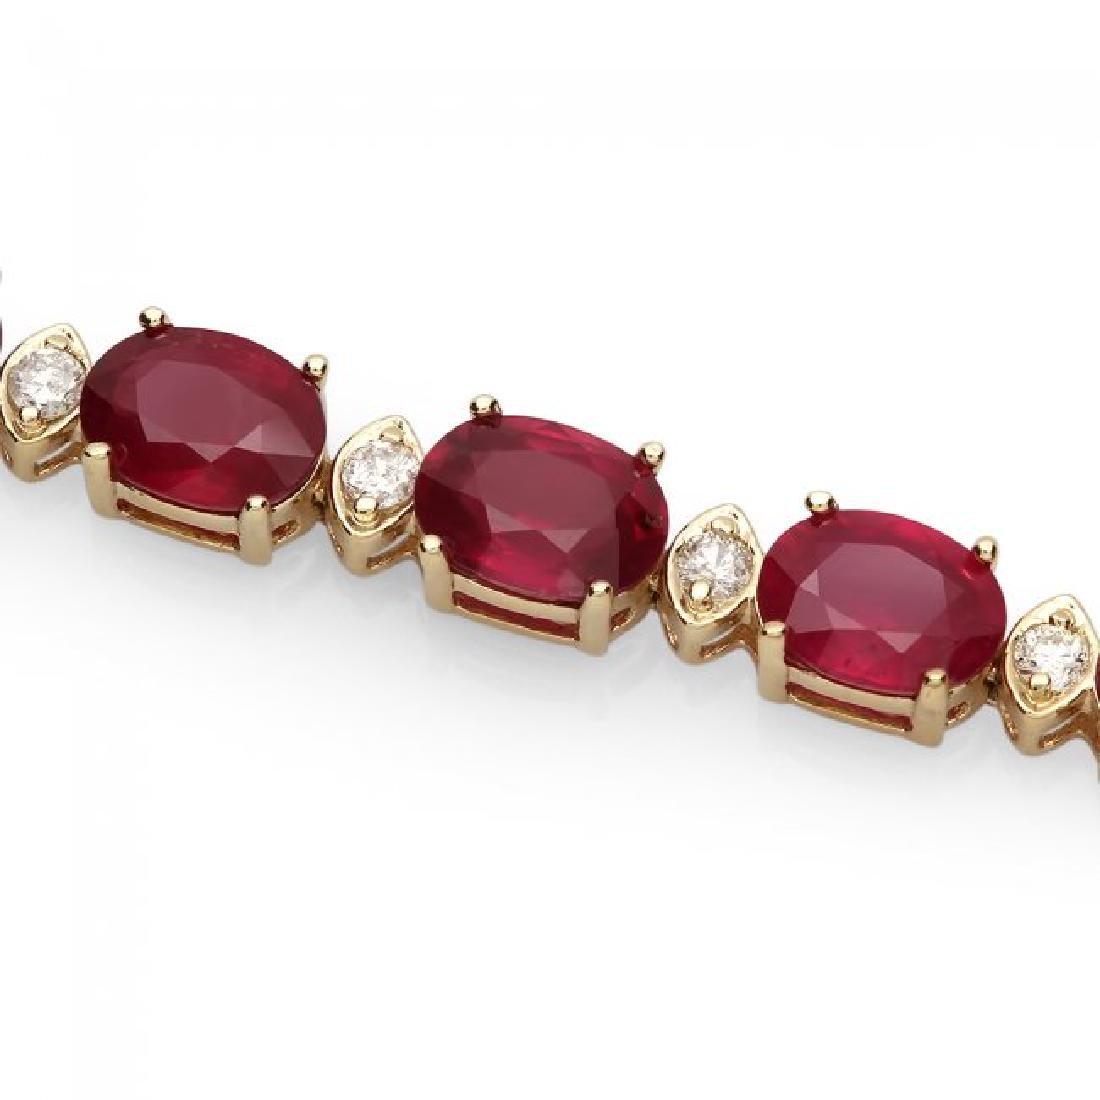 14k Gold 27.50ct Ruby 0.90ct Diamond Bracelet